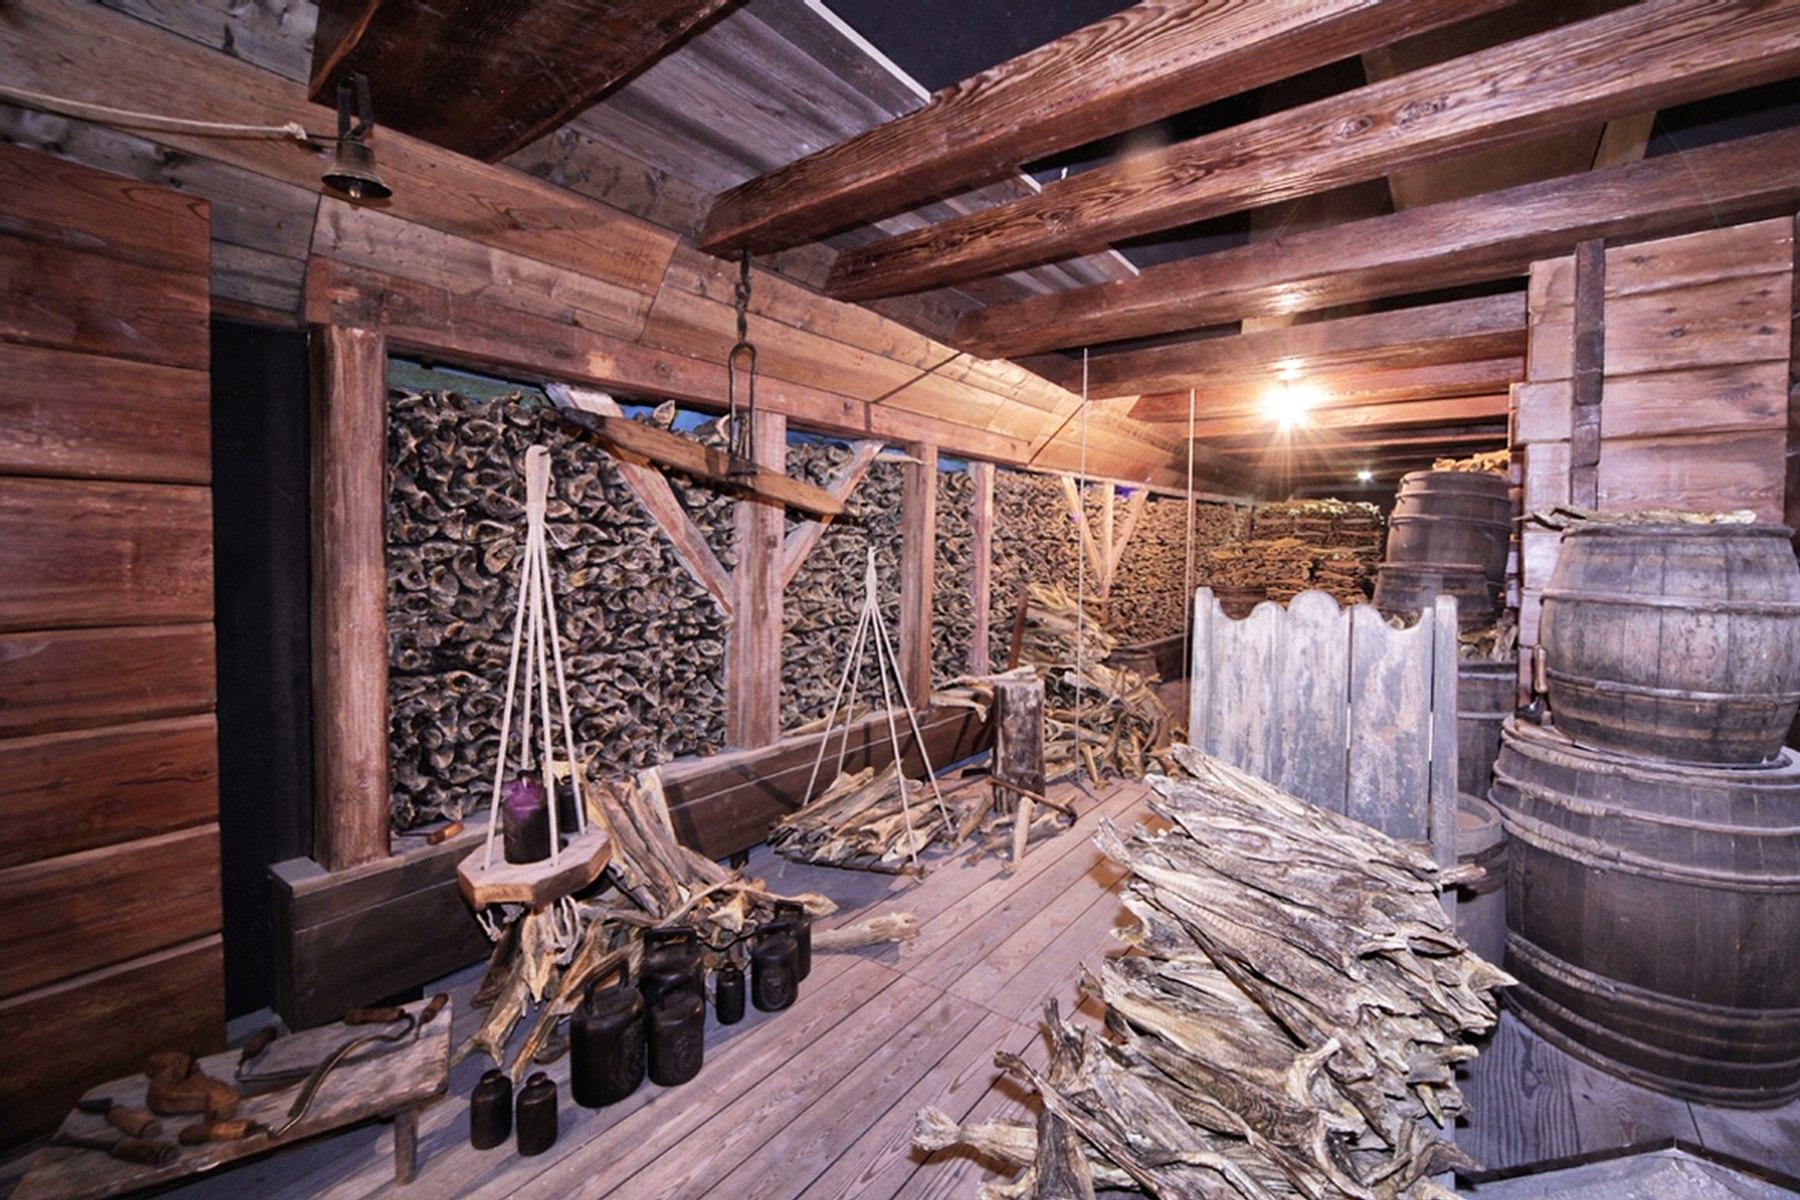 l beck meets bergen das lteste hansemuseum der welt stellt sich vor ausstellung museen. Black Bedroom Furniture Sets. Home Design Ideas